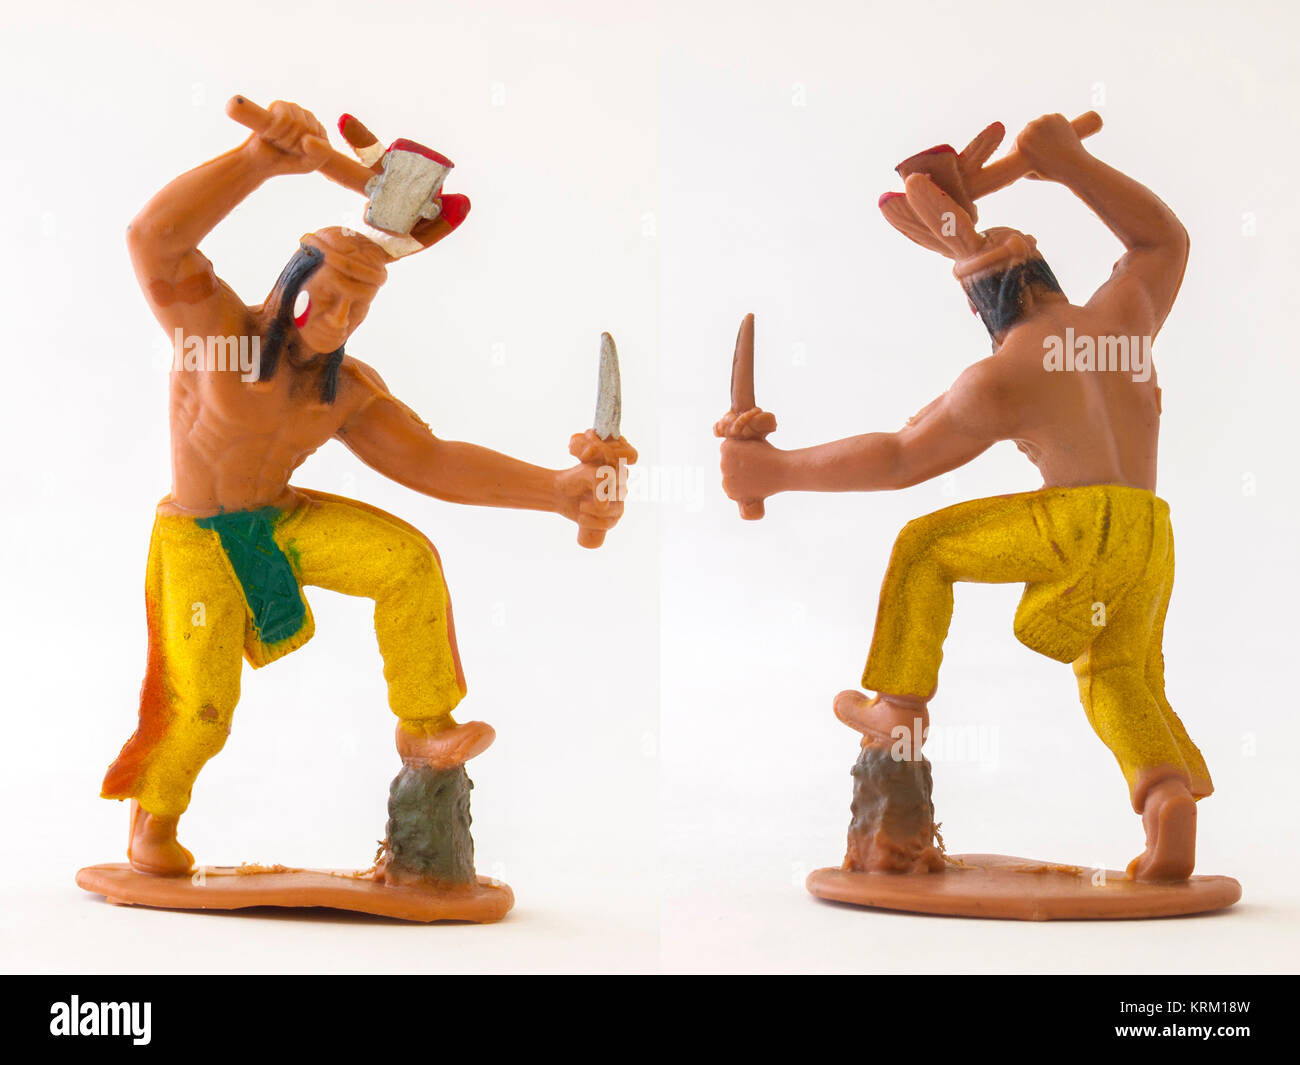 Indian cowboy mini figure model toy / Isolated white - Stock Image